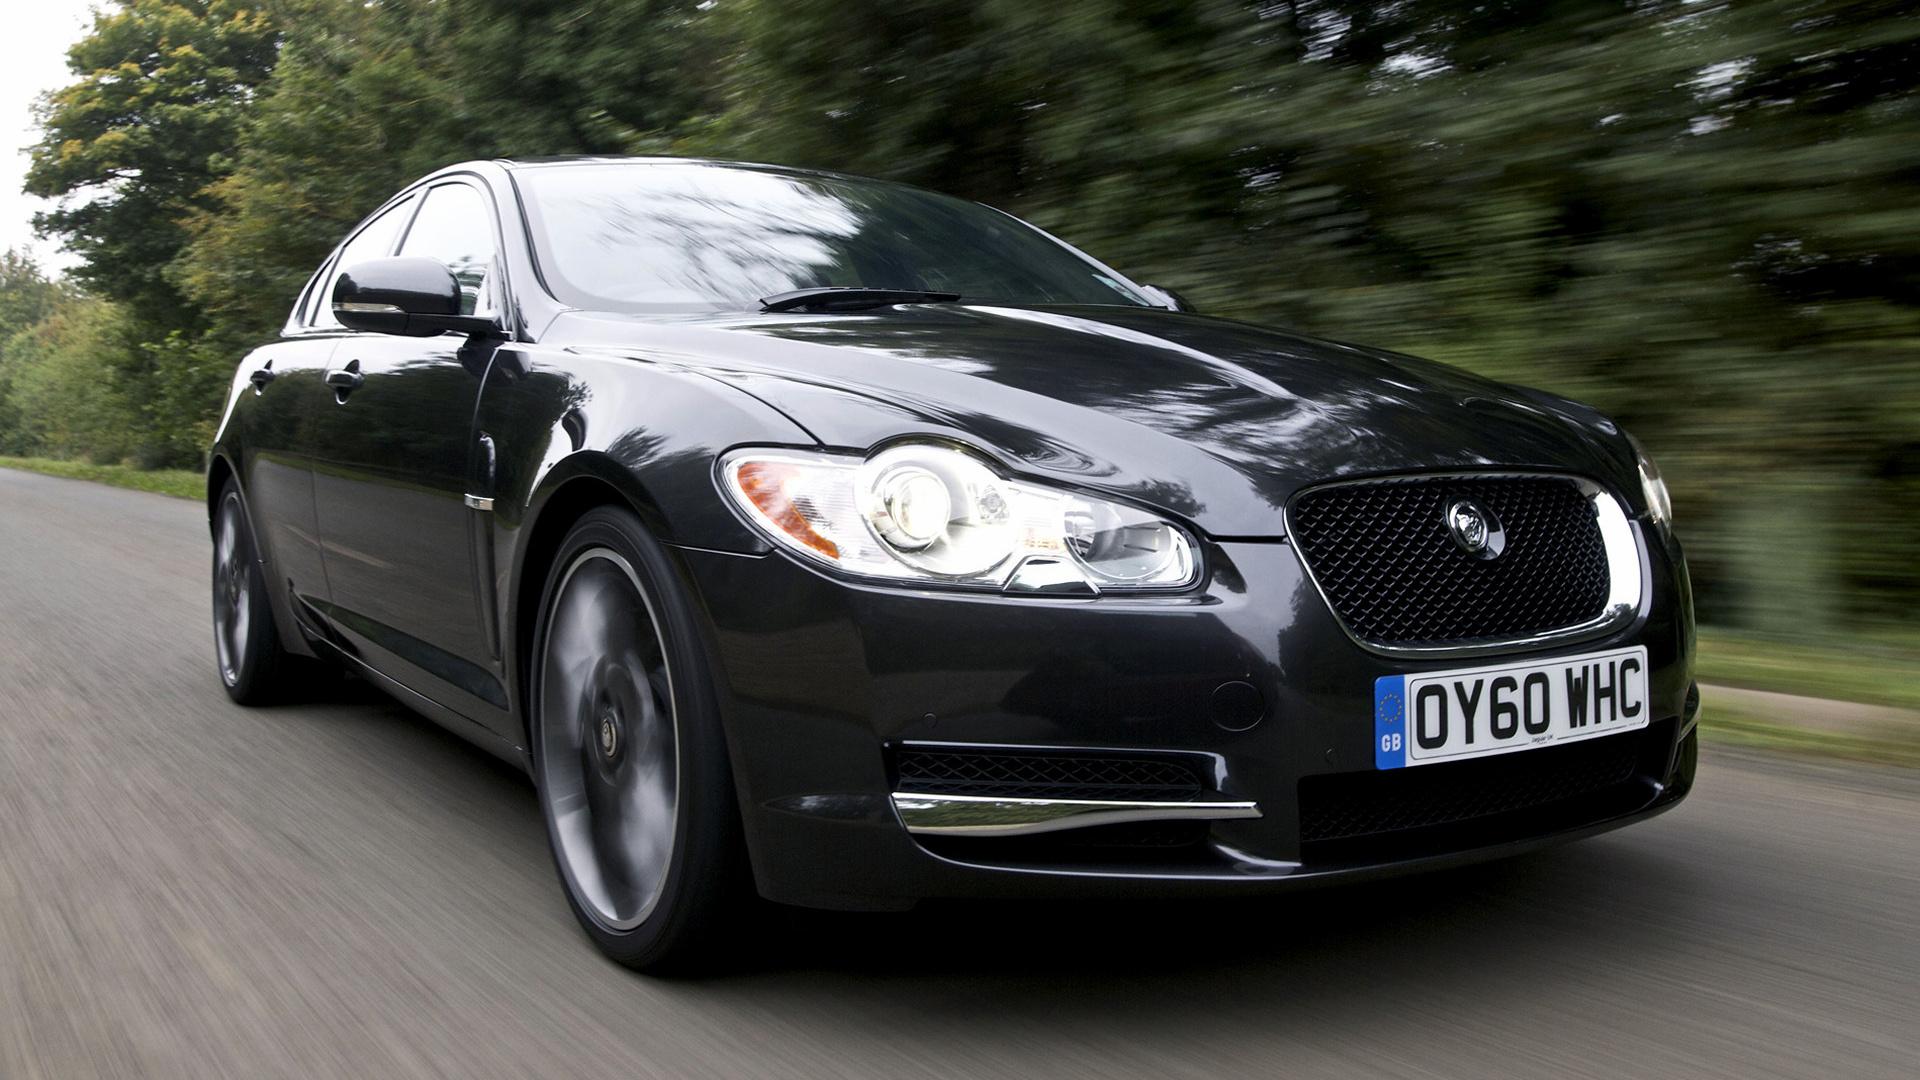 Jaguar xf s black pack 2010 uk wallpapers and hd images car pixel hd 169 voltagebd Choice Image